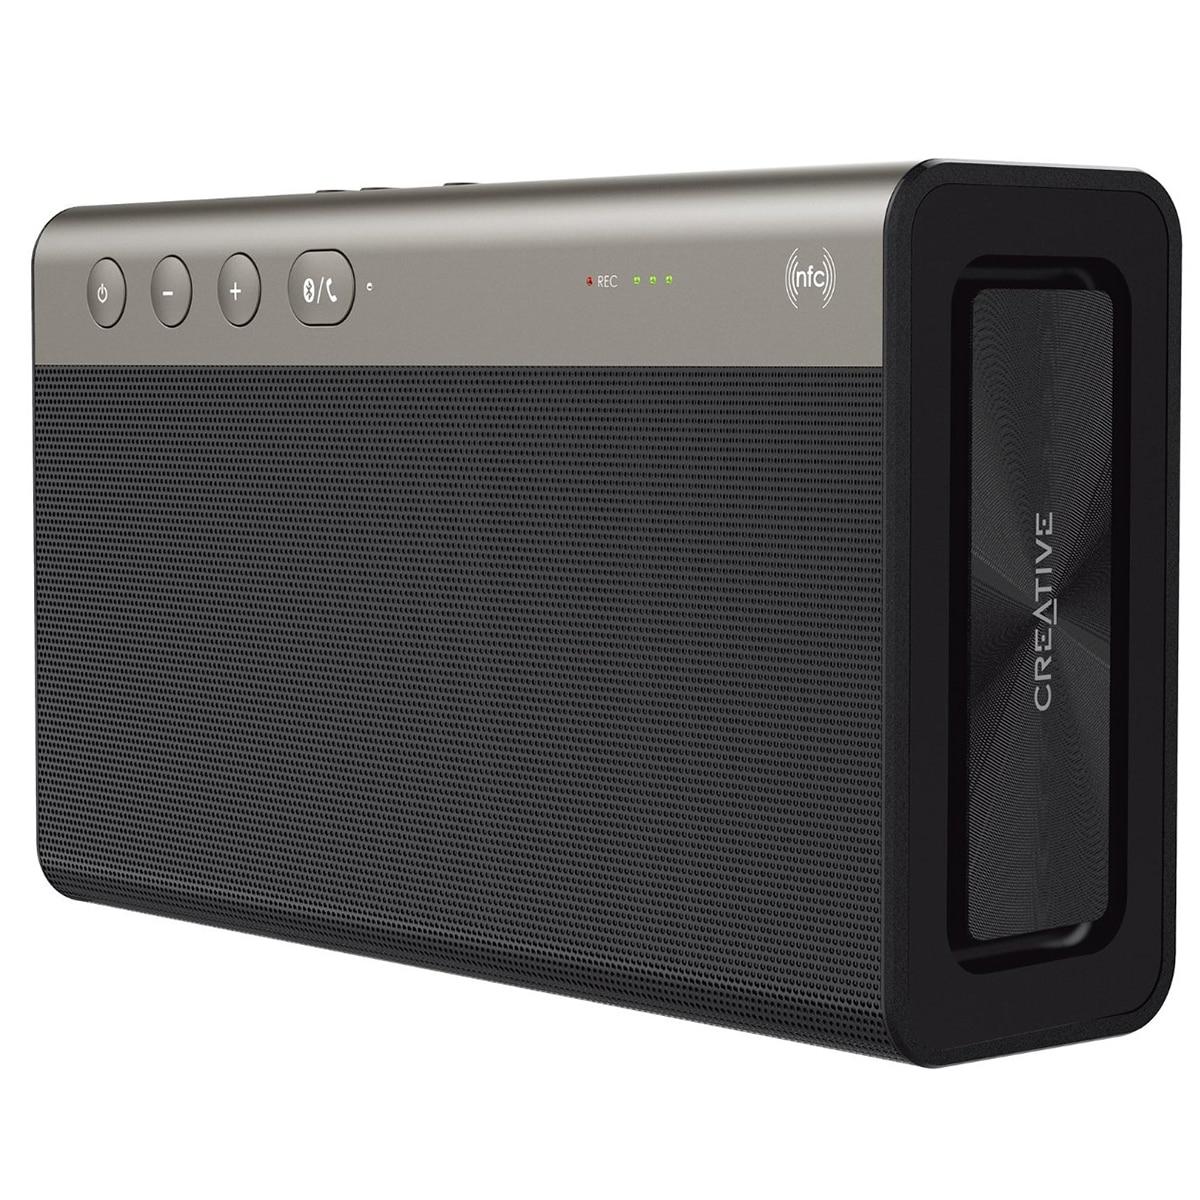 Fotografie Boxa portabila wireless Creative Sound Blaster Roar 2 CLE-R, Bluetooth, NFC, Powerbank, MicroSD reader, Black